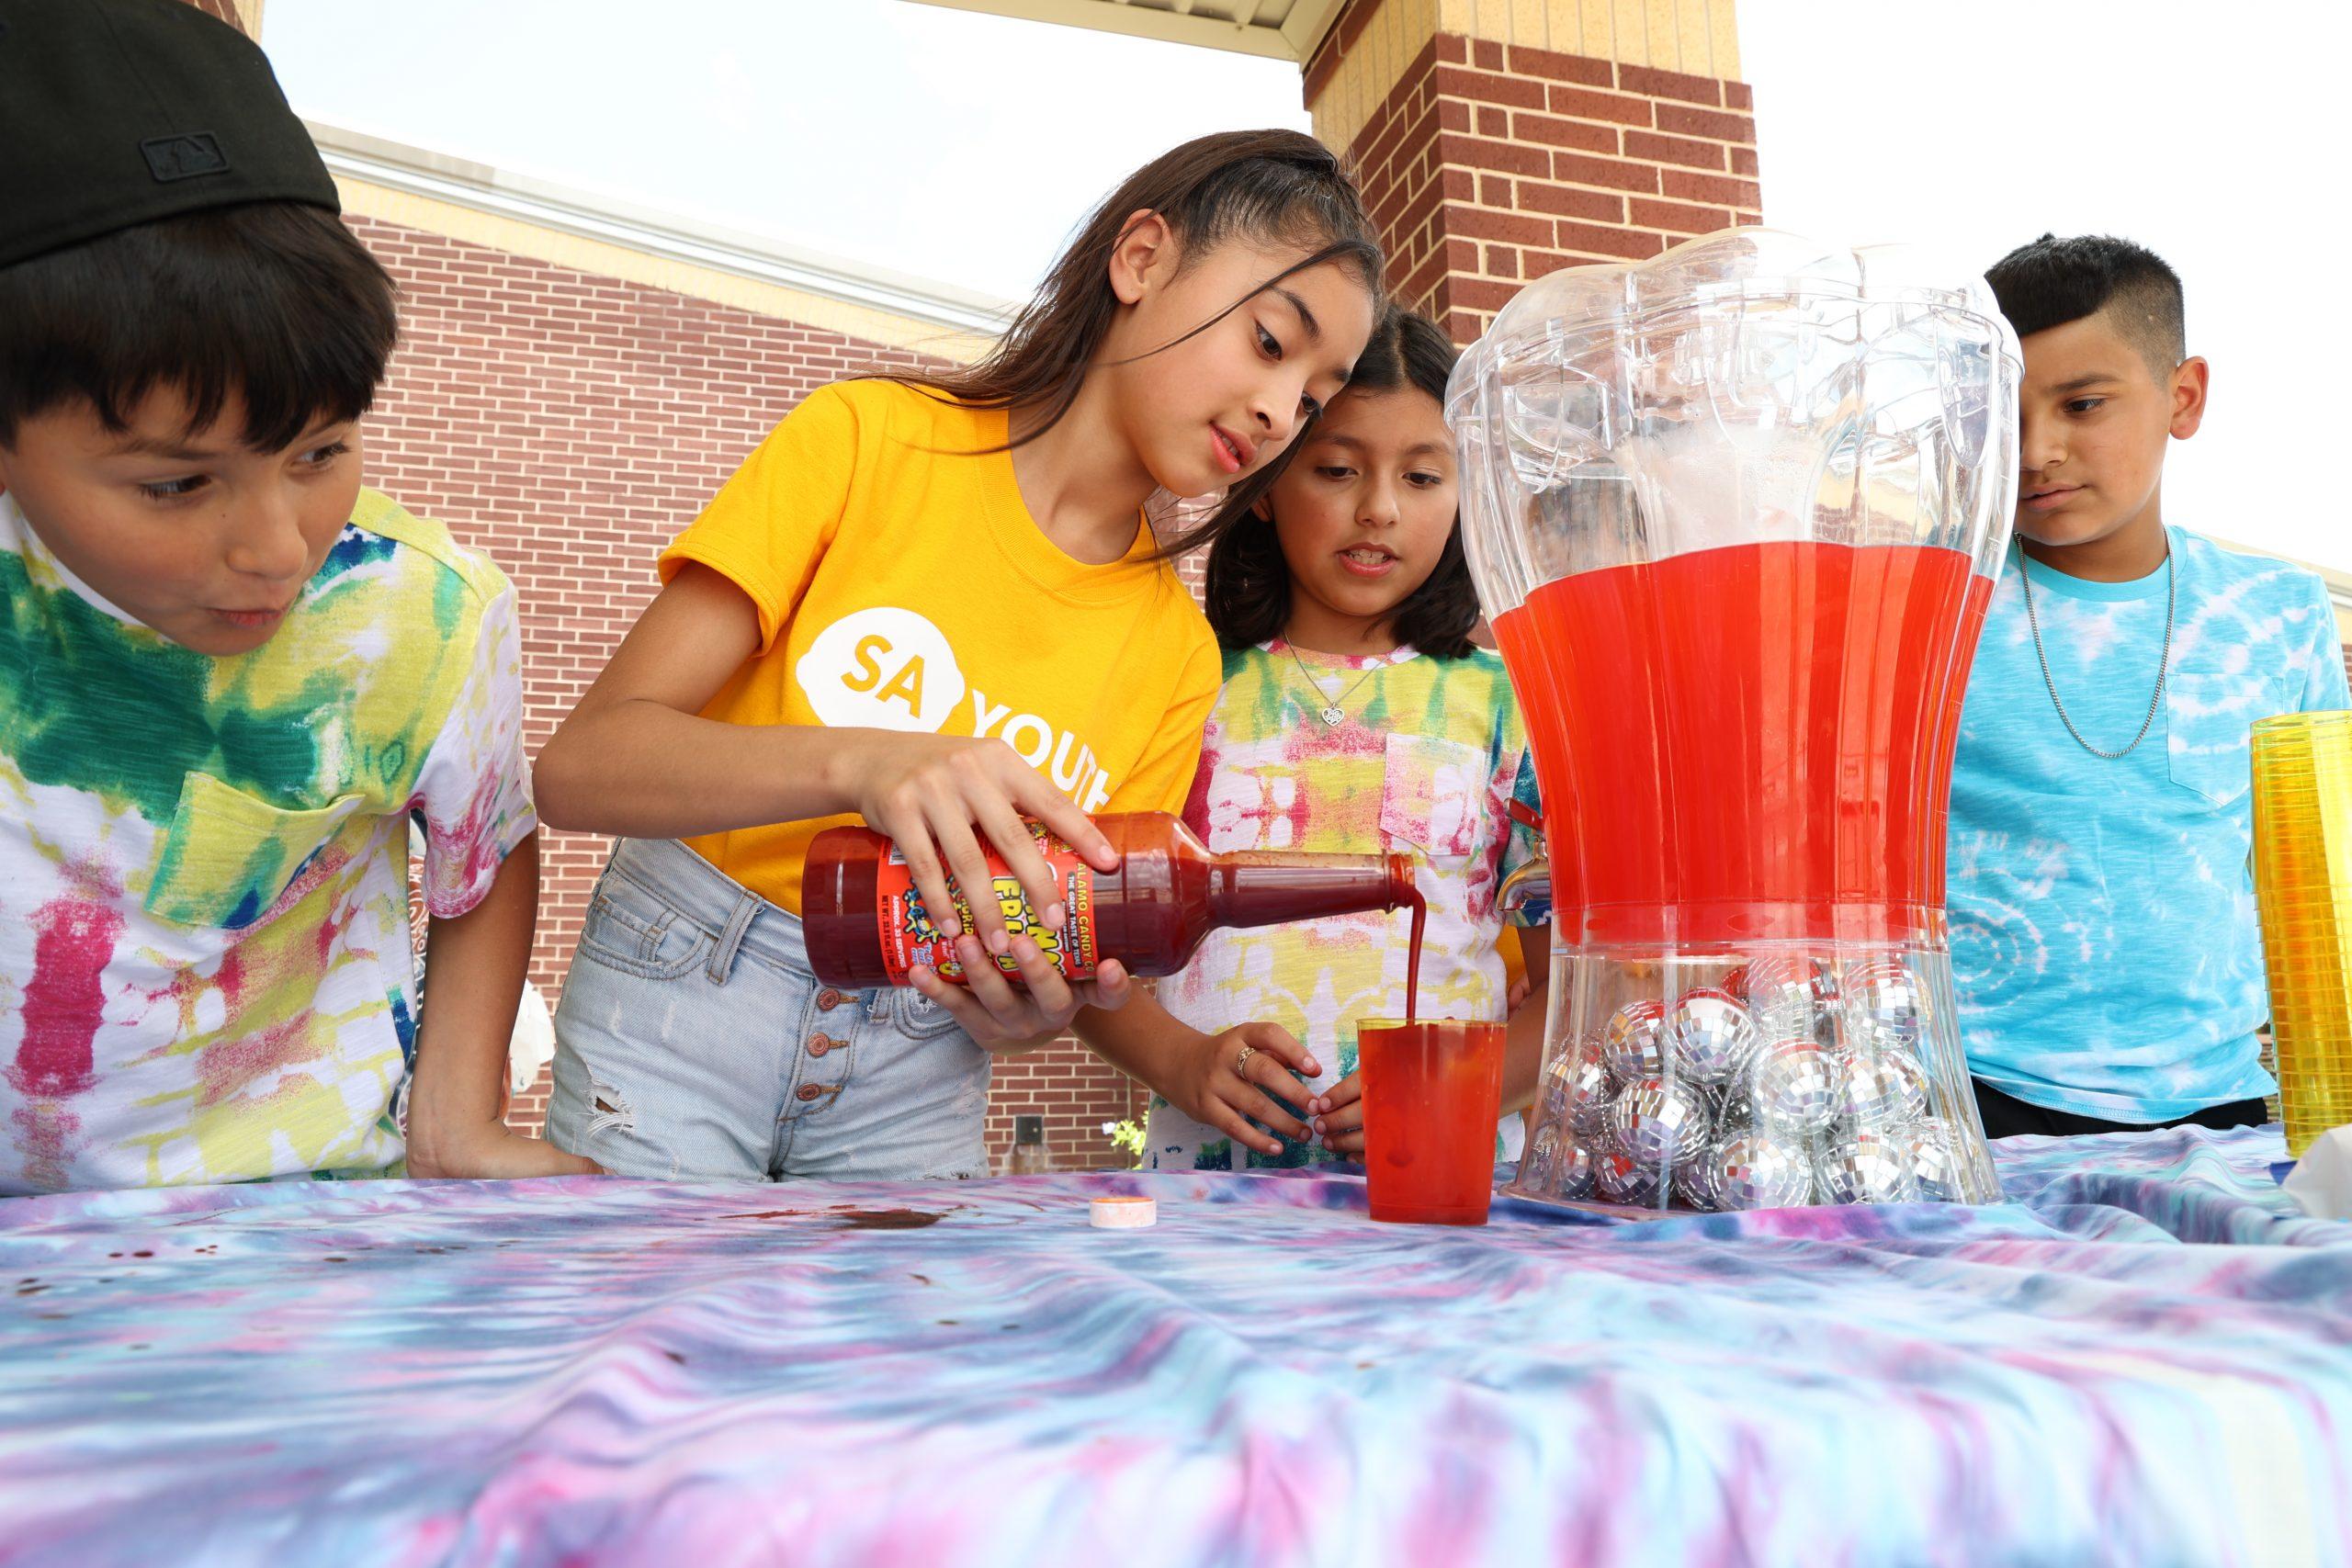 South San ISD students earn money, learn business skills on Lemonade Day